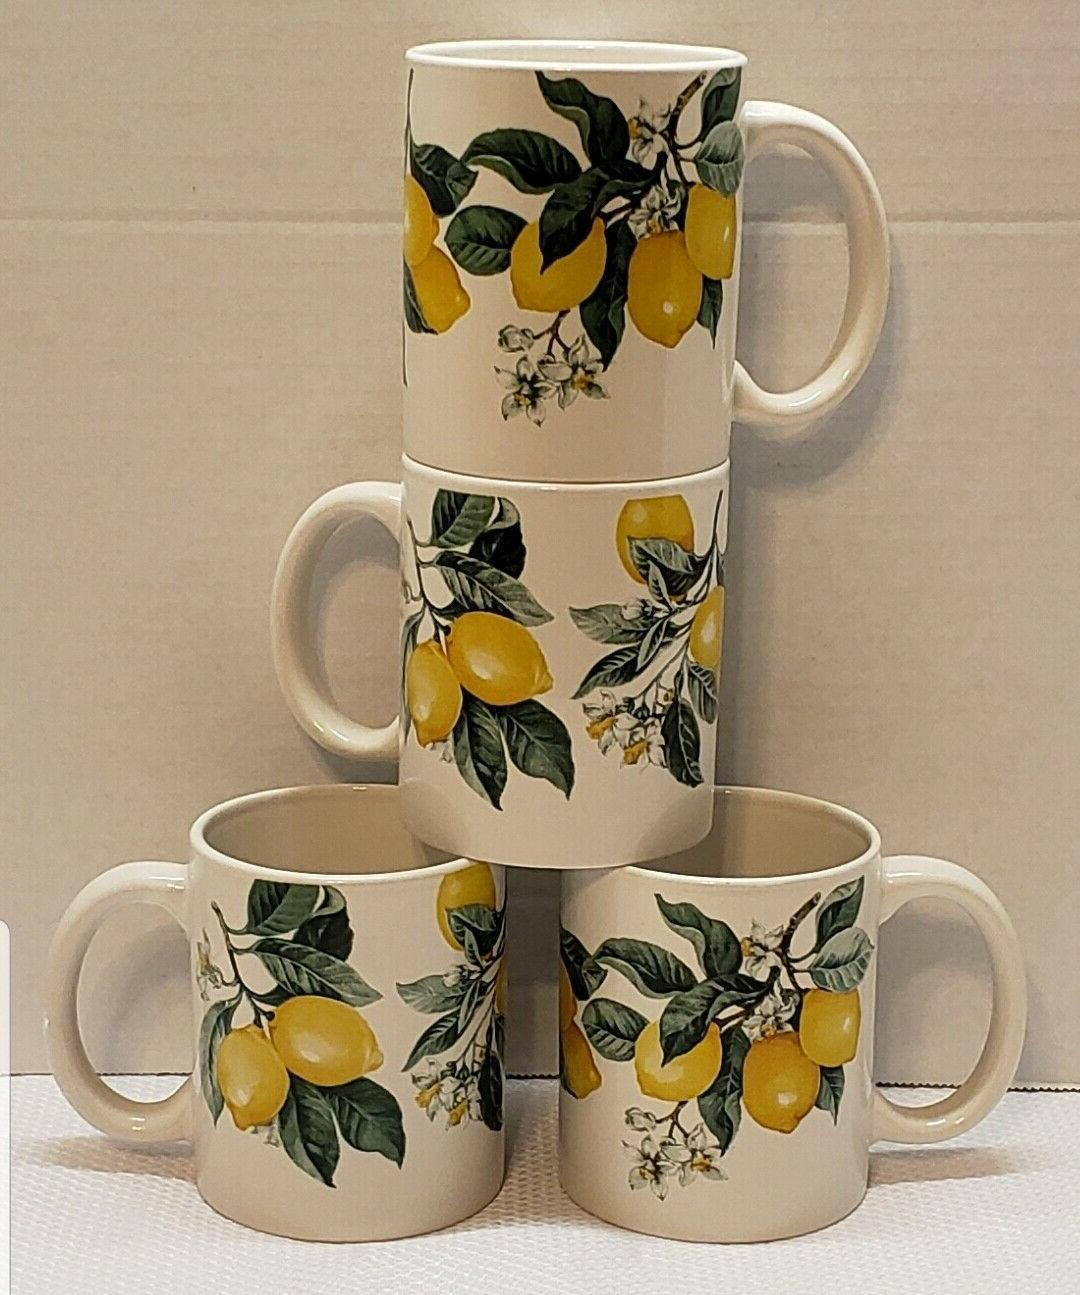 Lemon Printed Ceramic Set 16